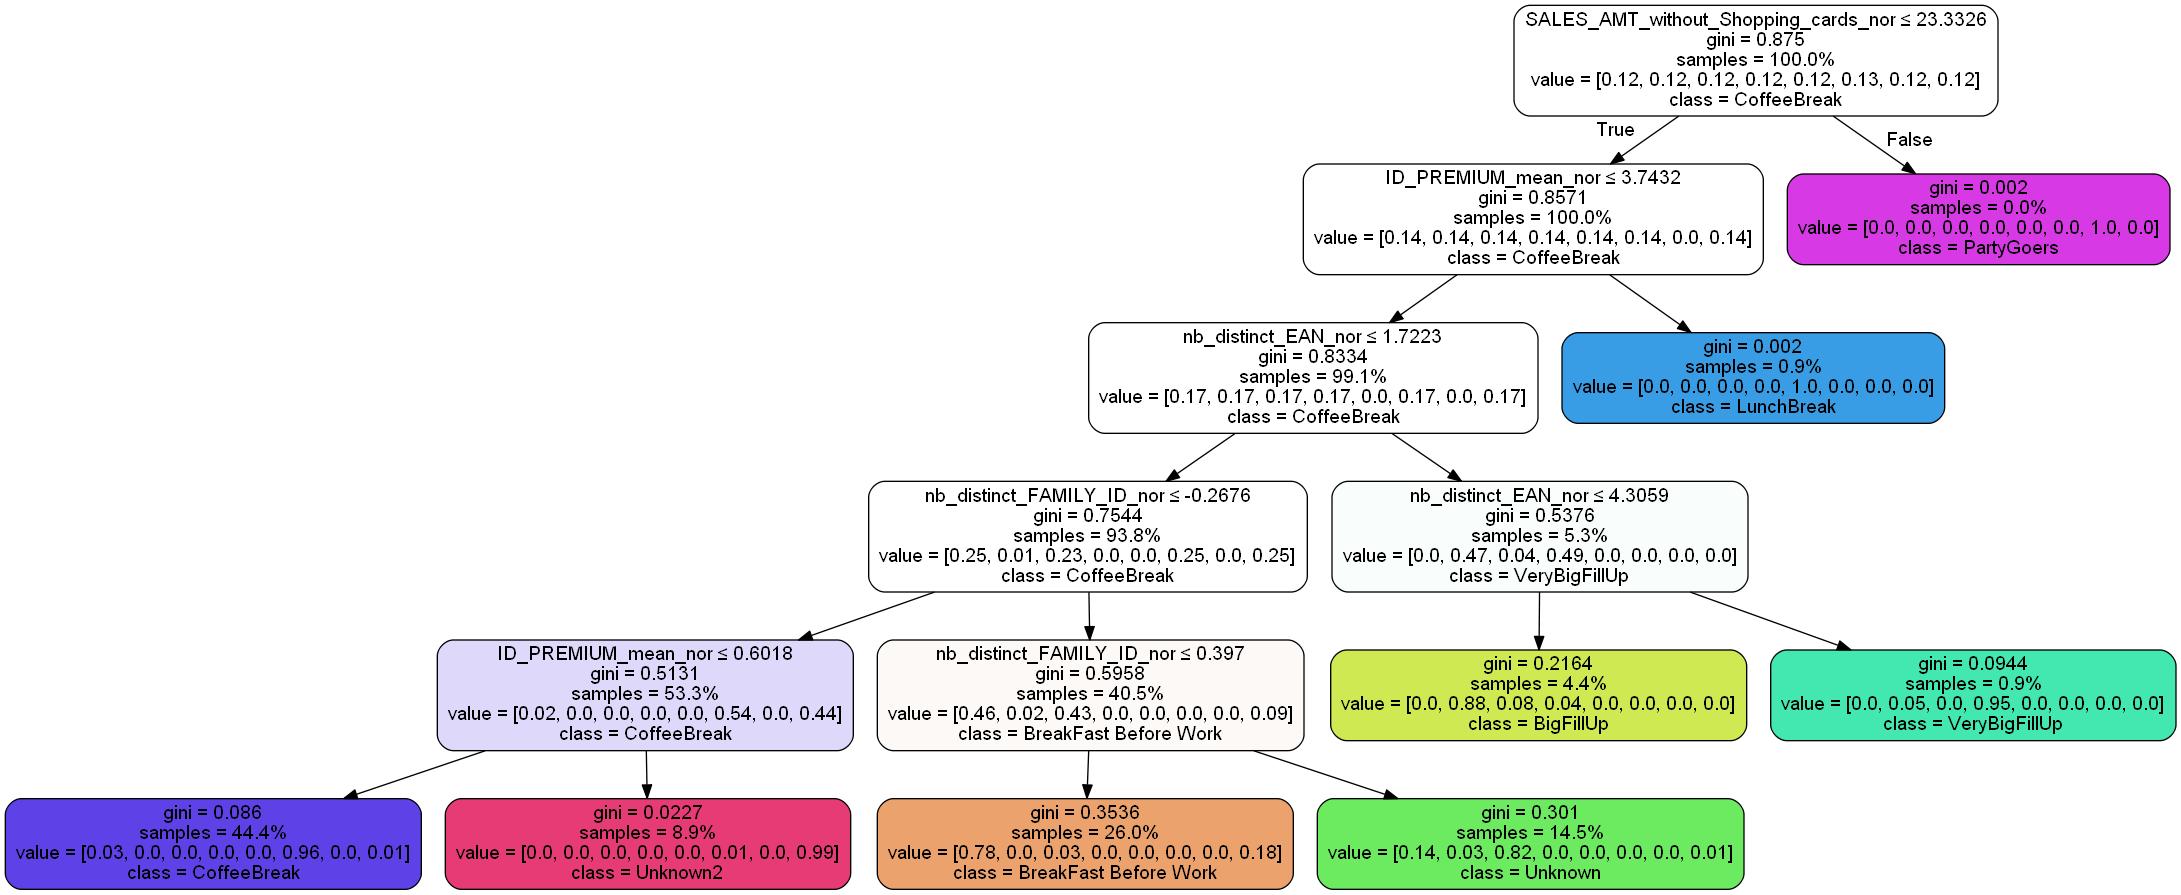 Decion tree output - Alteryx Community